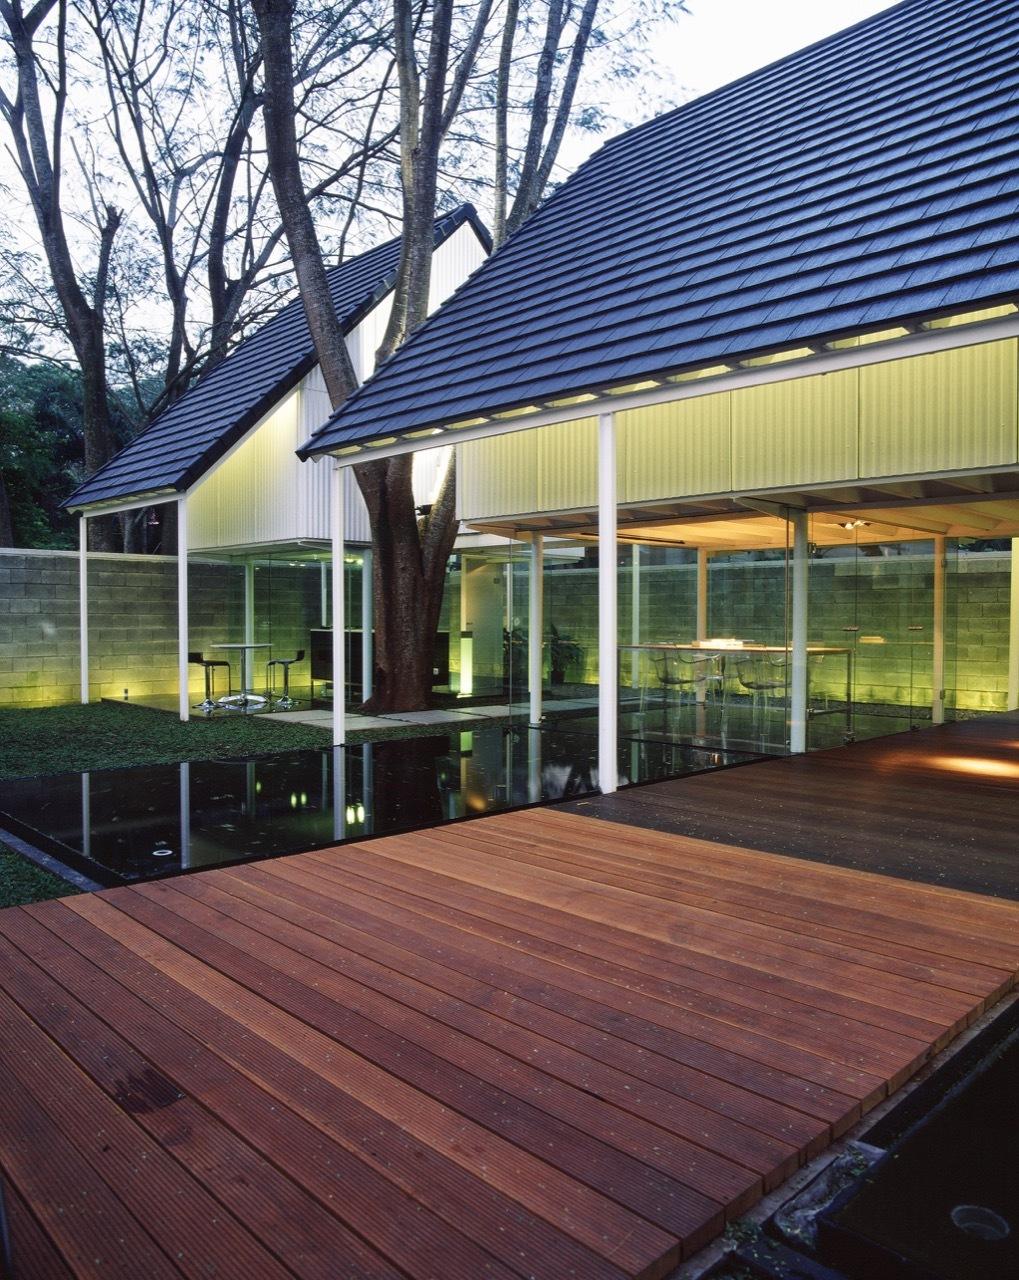 Floating Studio / Studio Air Putih | ArchDaily